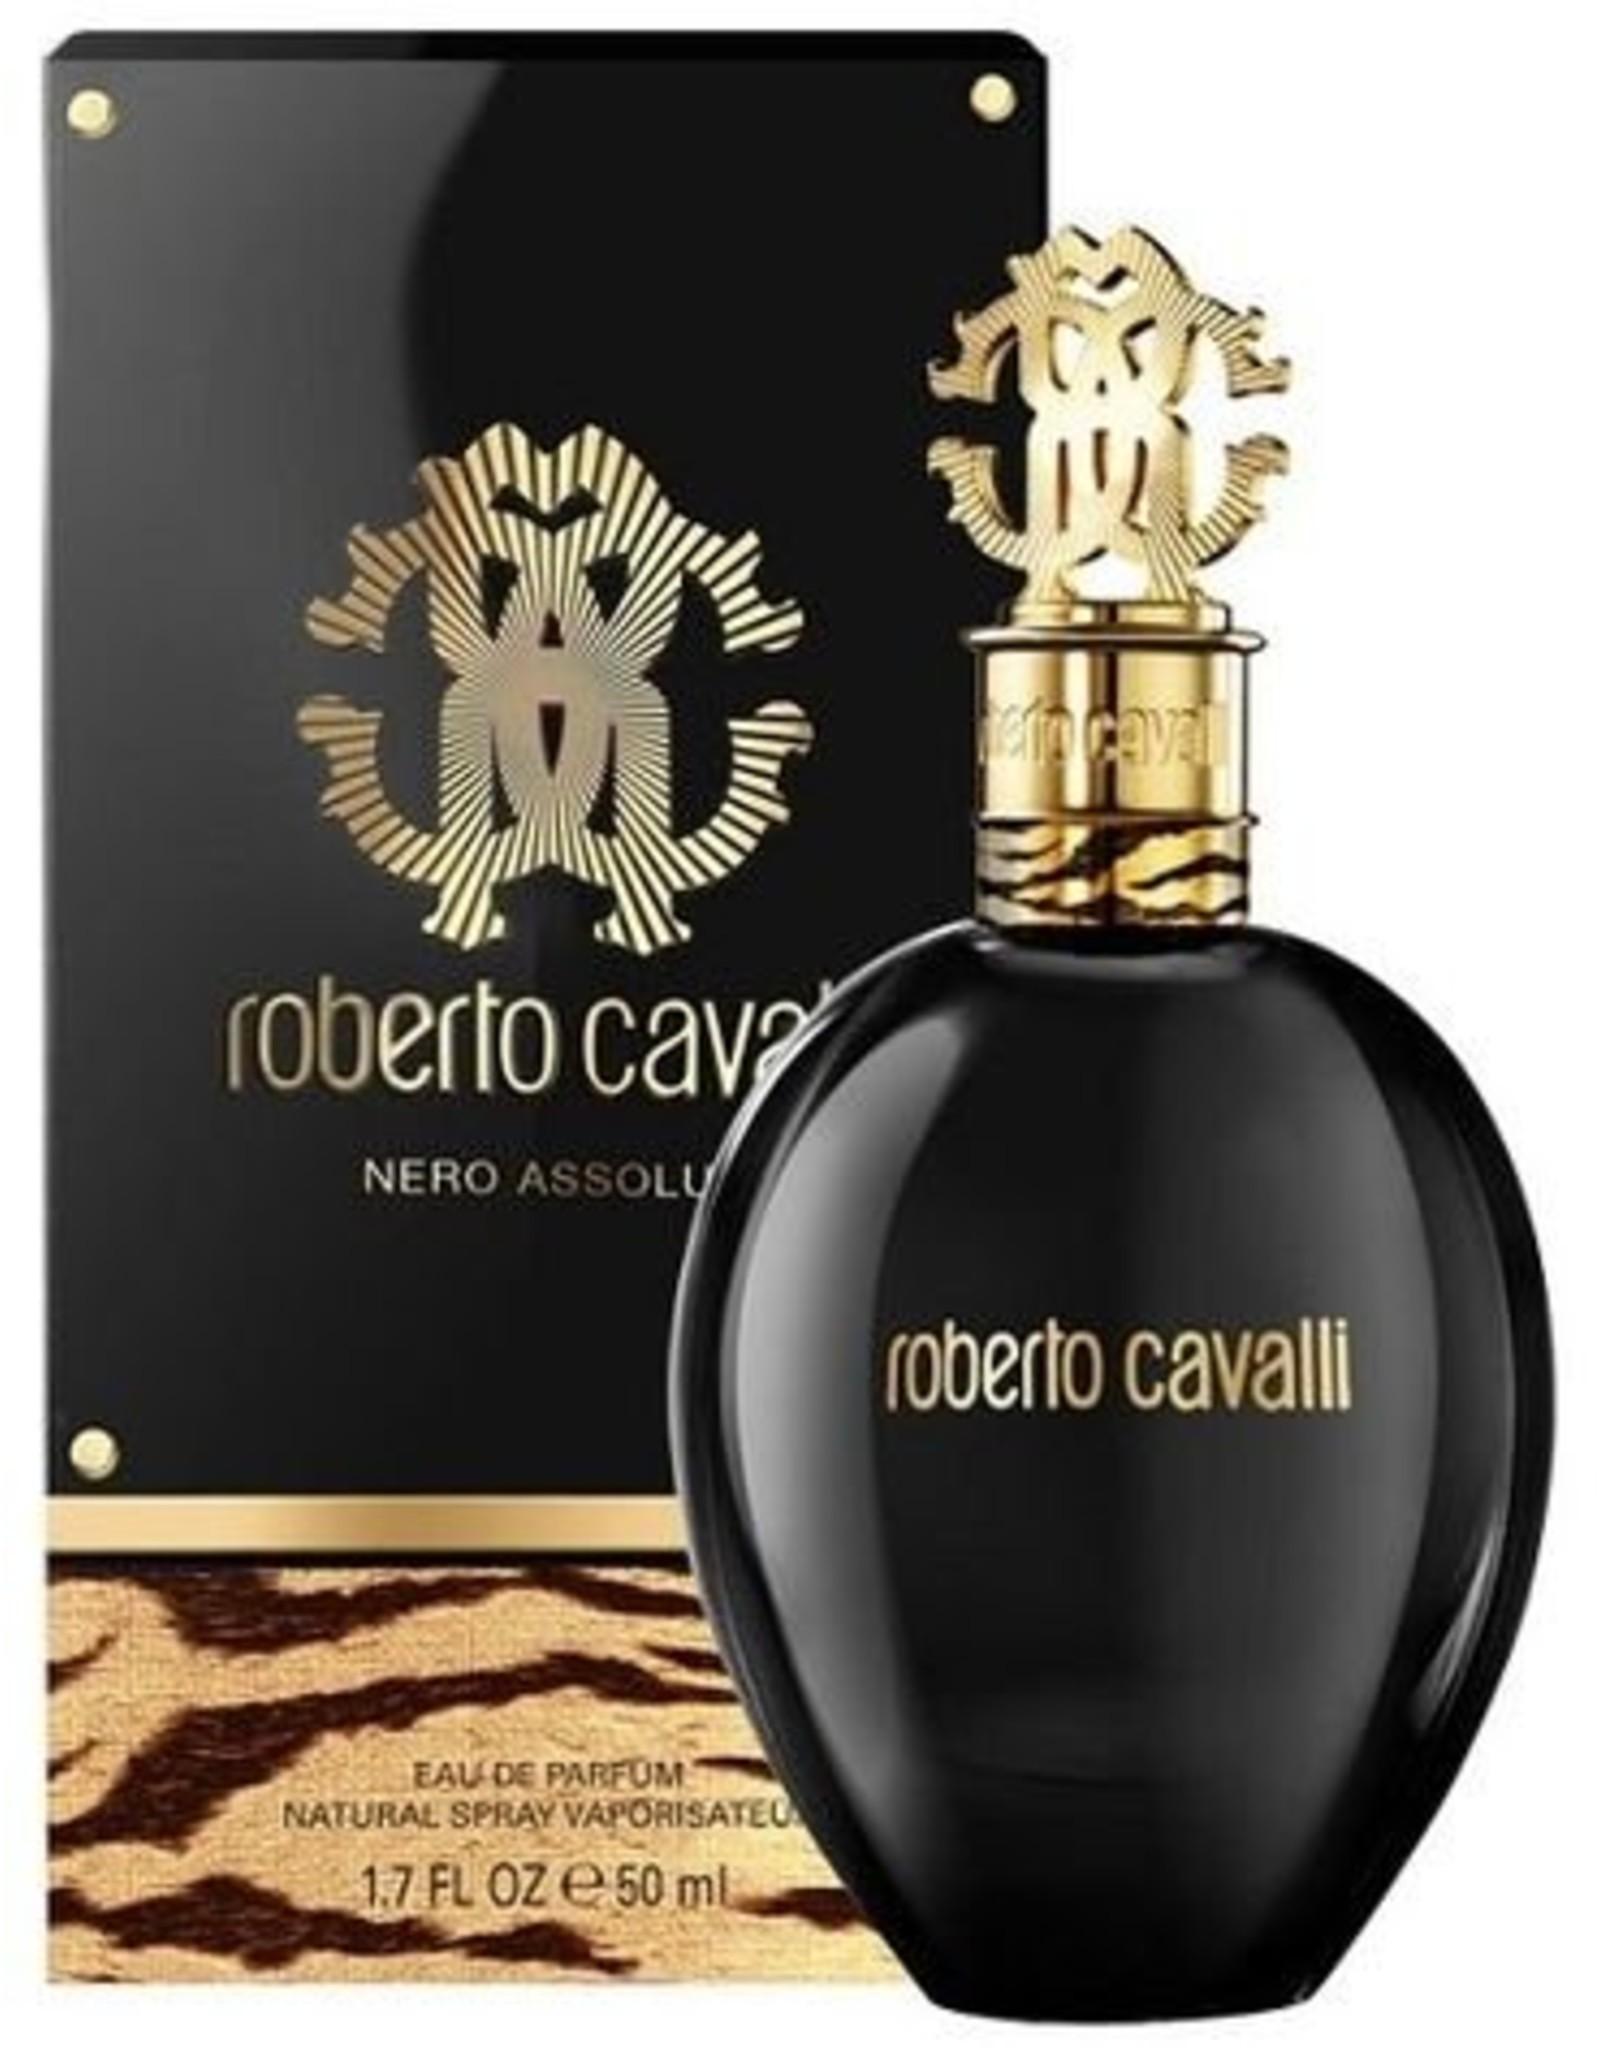 ROBERTO CAVALLI ROBERTO CAVALLI NERO ASSOLUTO